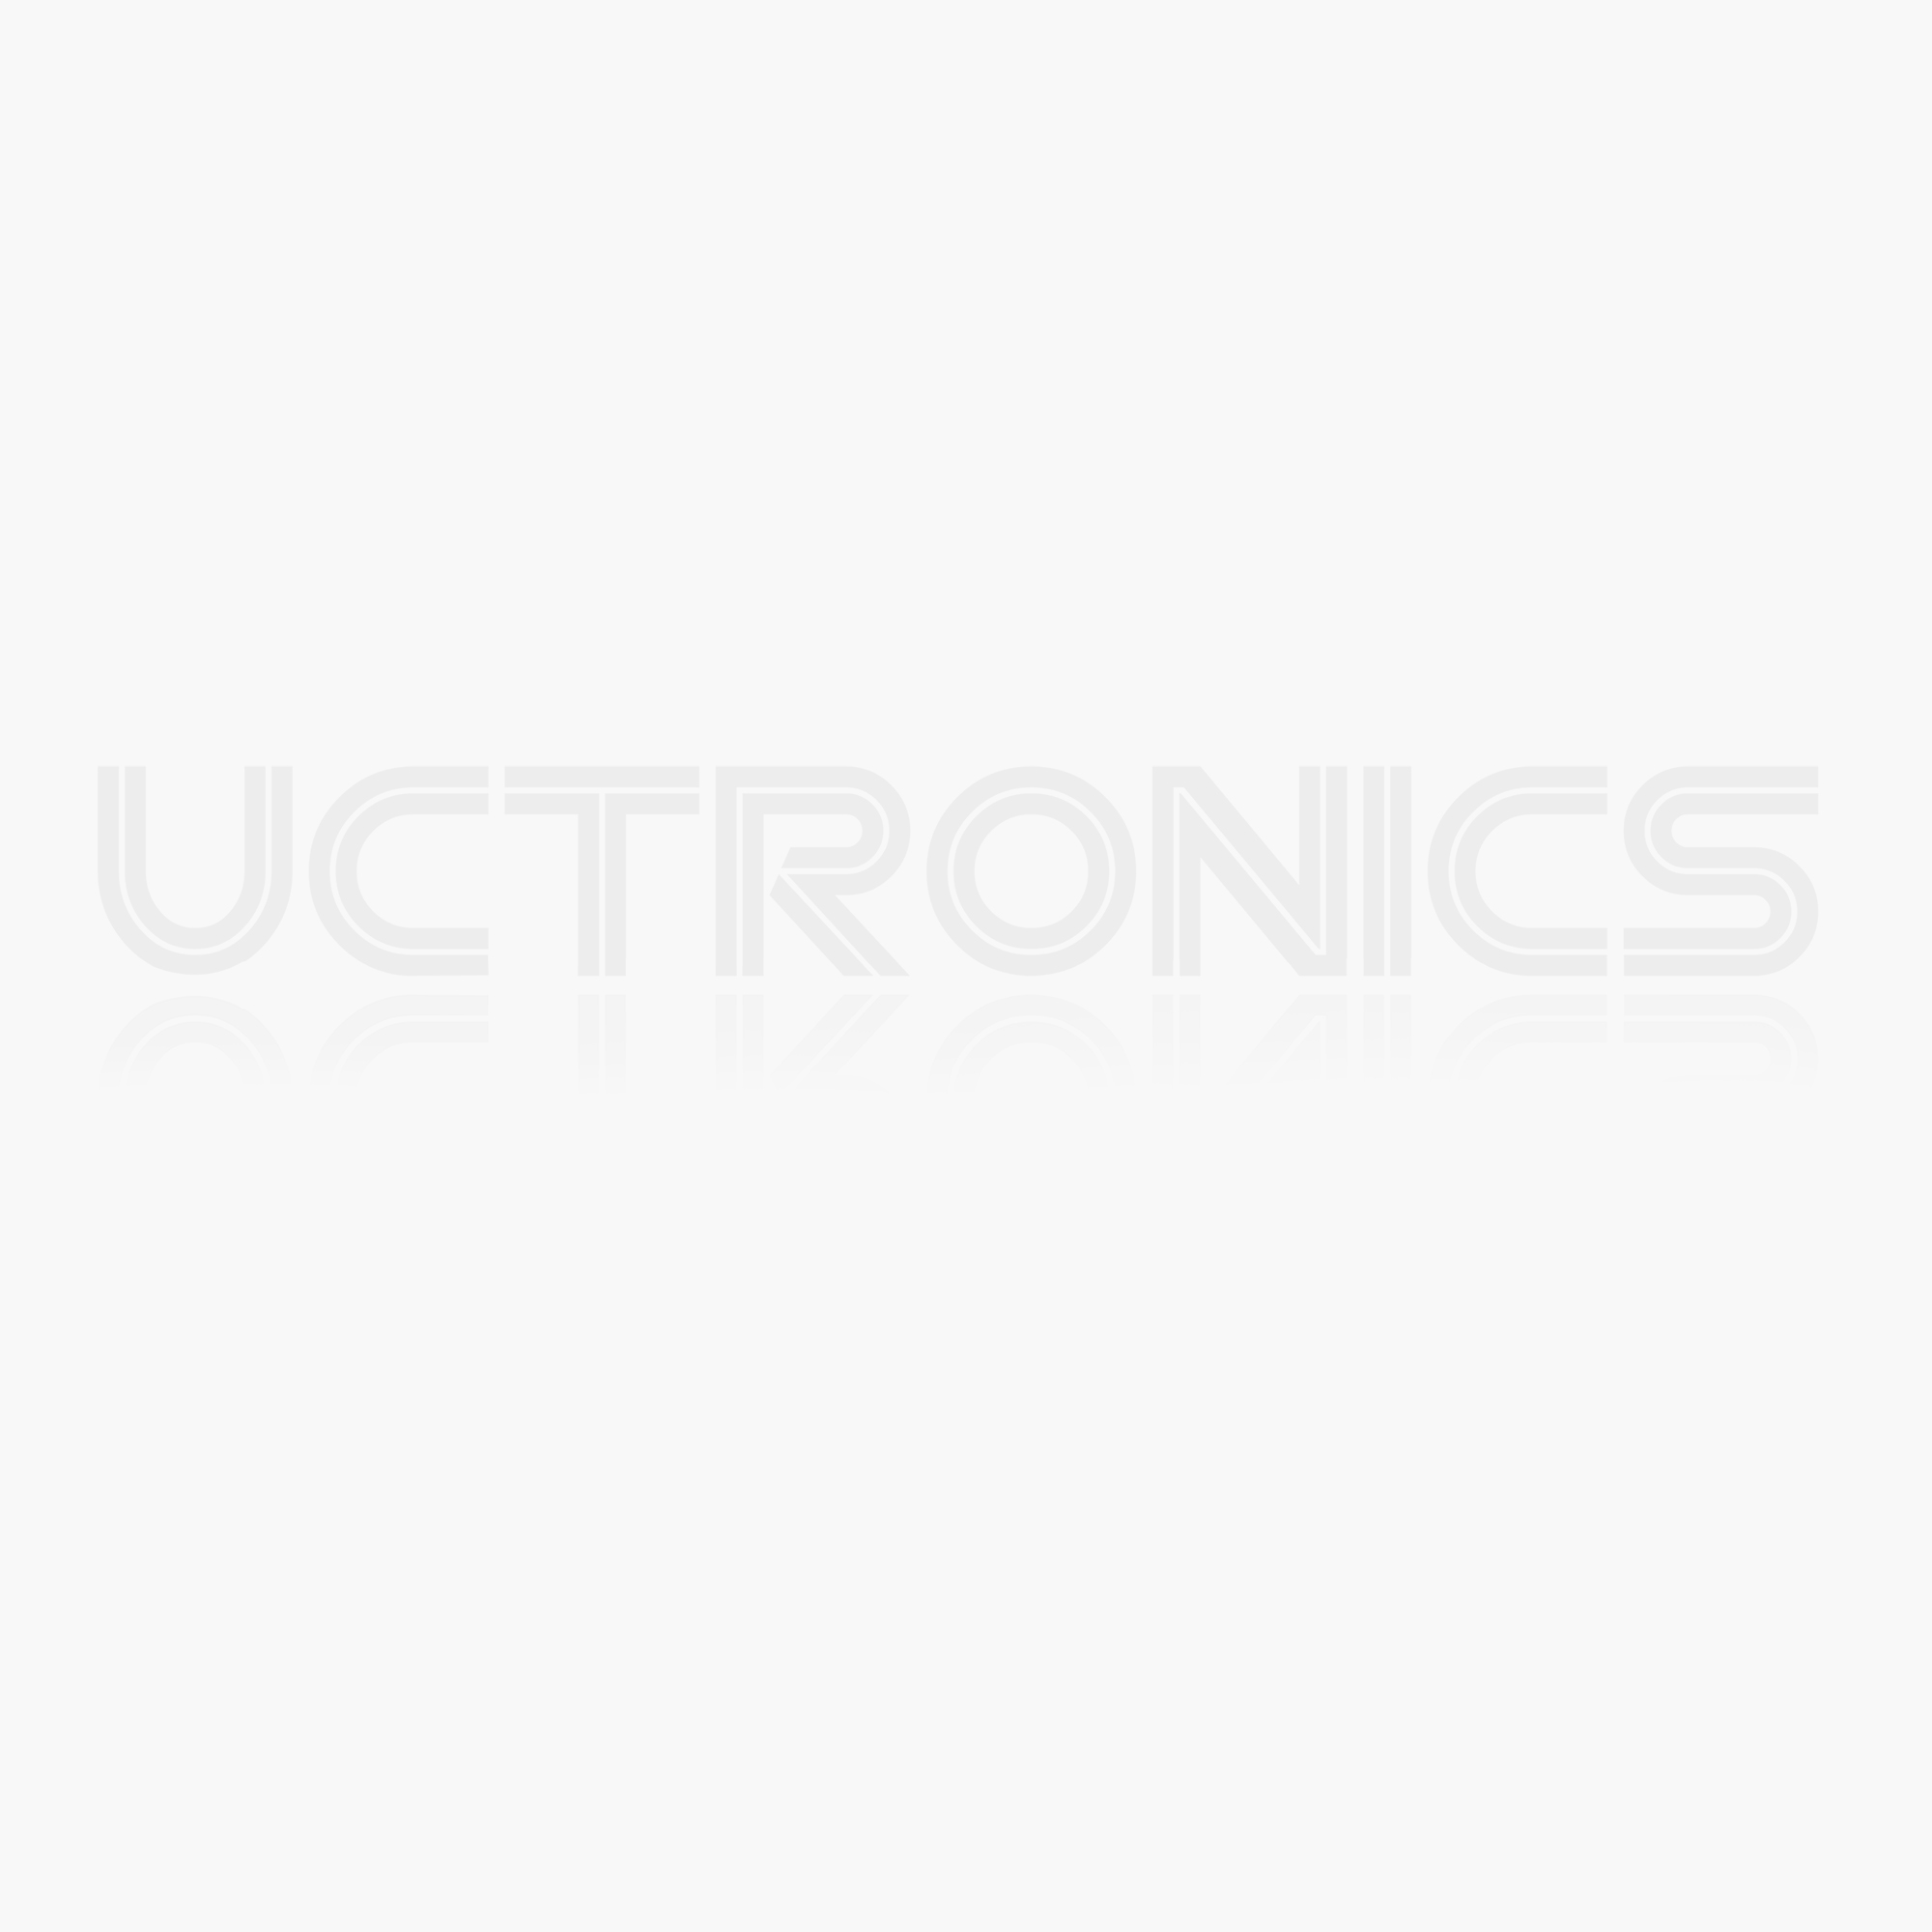 10pcs 2*7 2.54 IDC Socket Box header connector straight